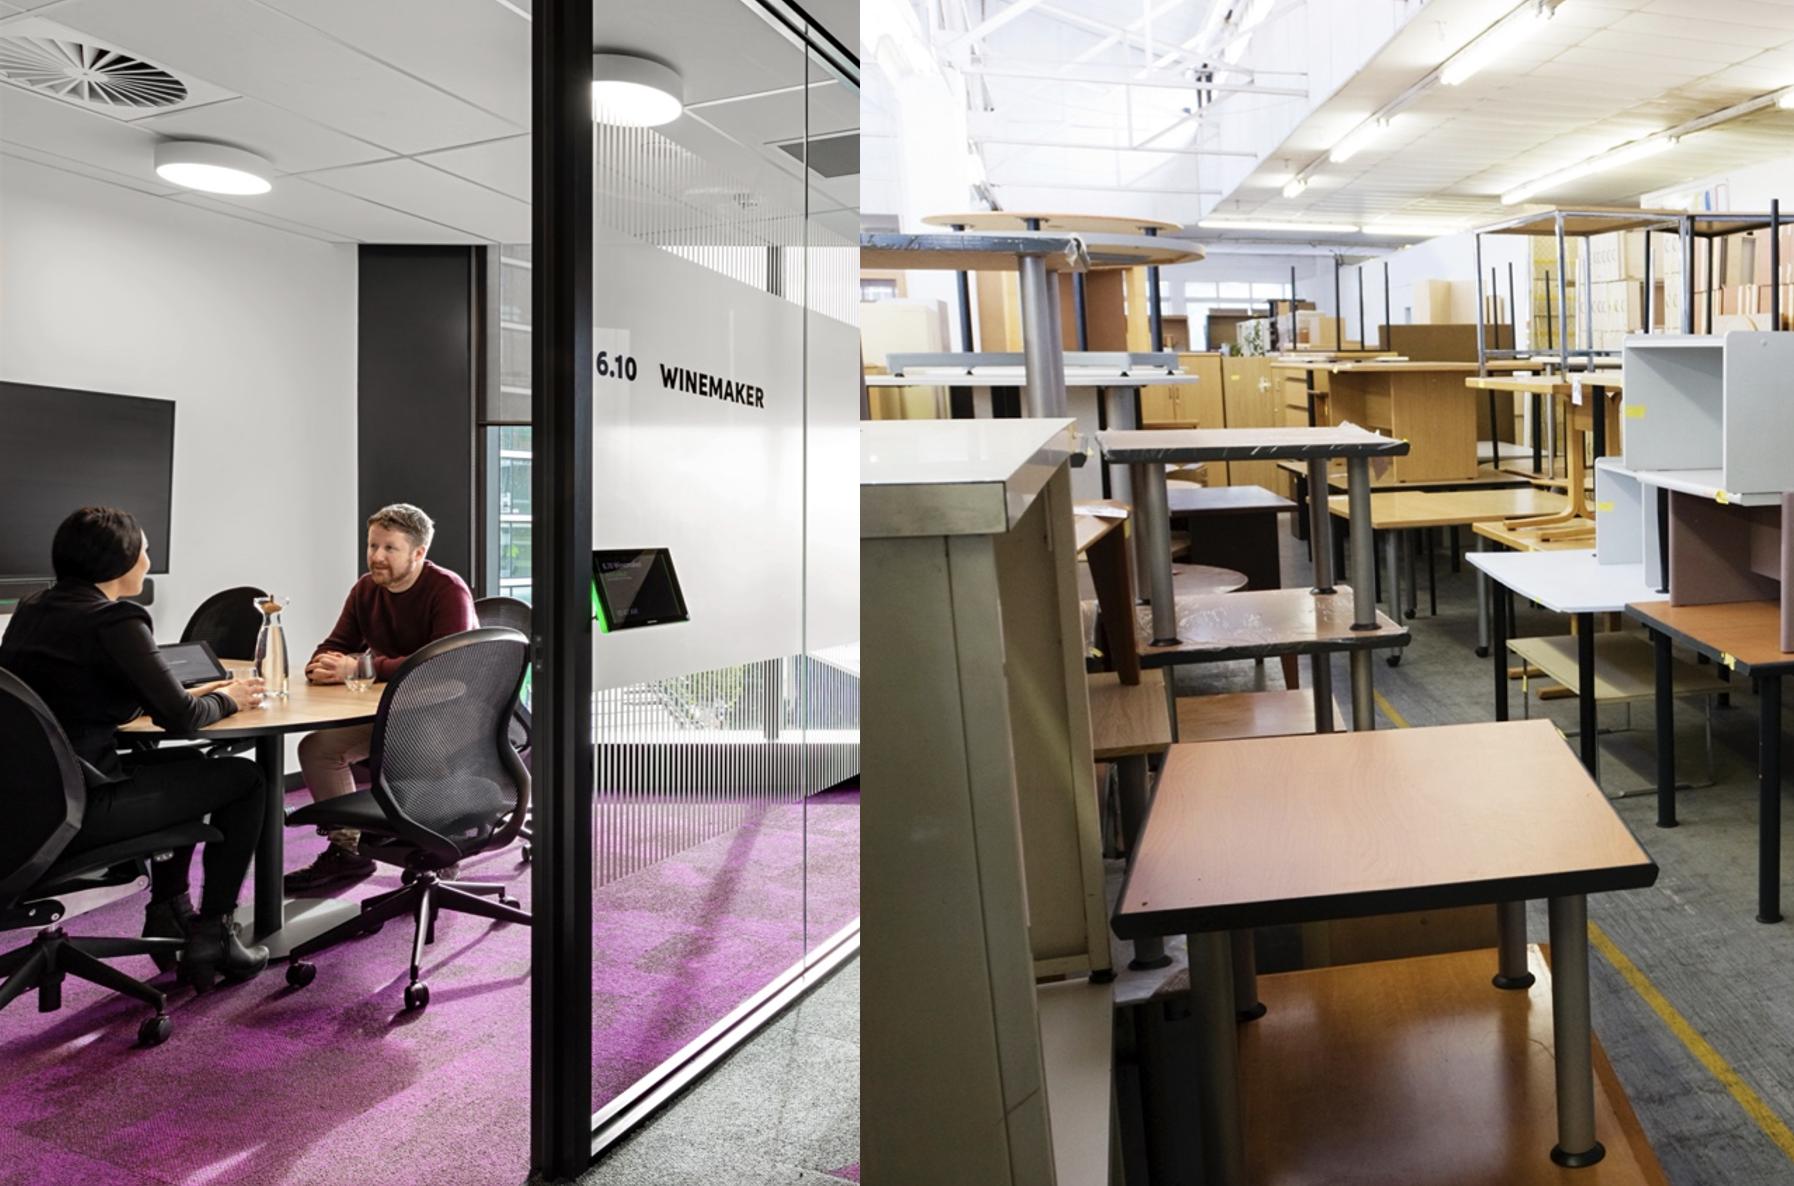 GlobalPSC teaming up to deliver national commercial furniture stewardship scheme